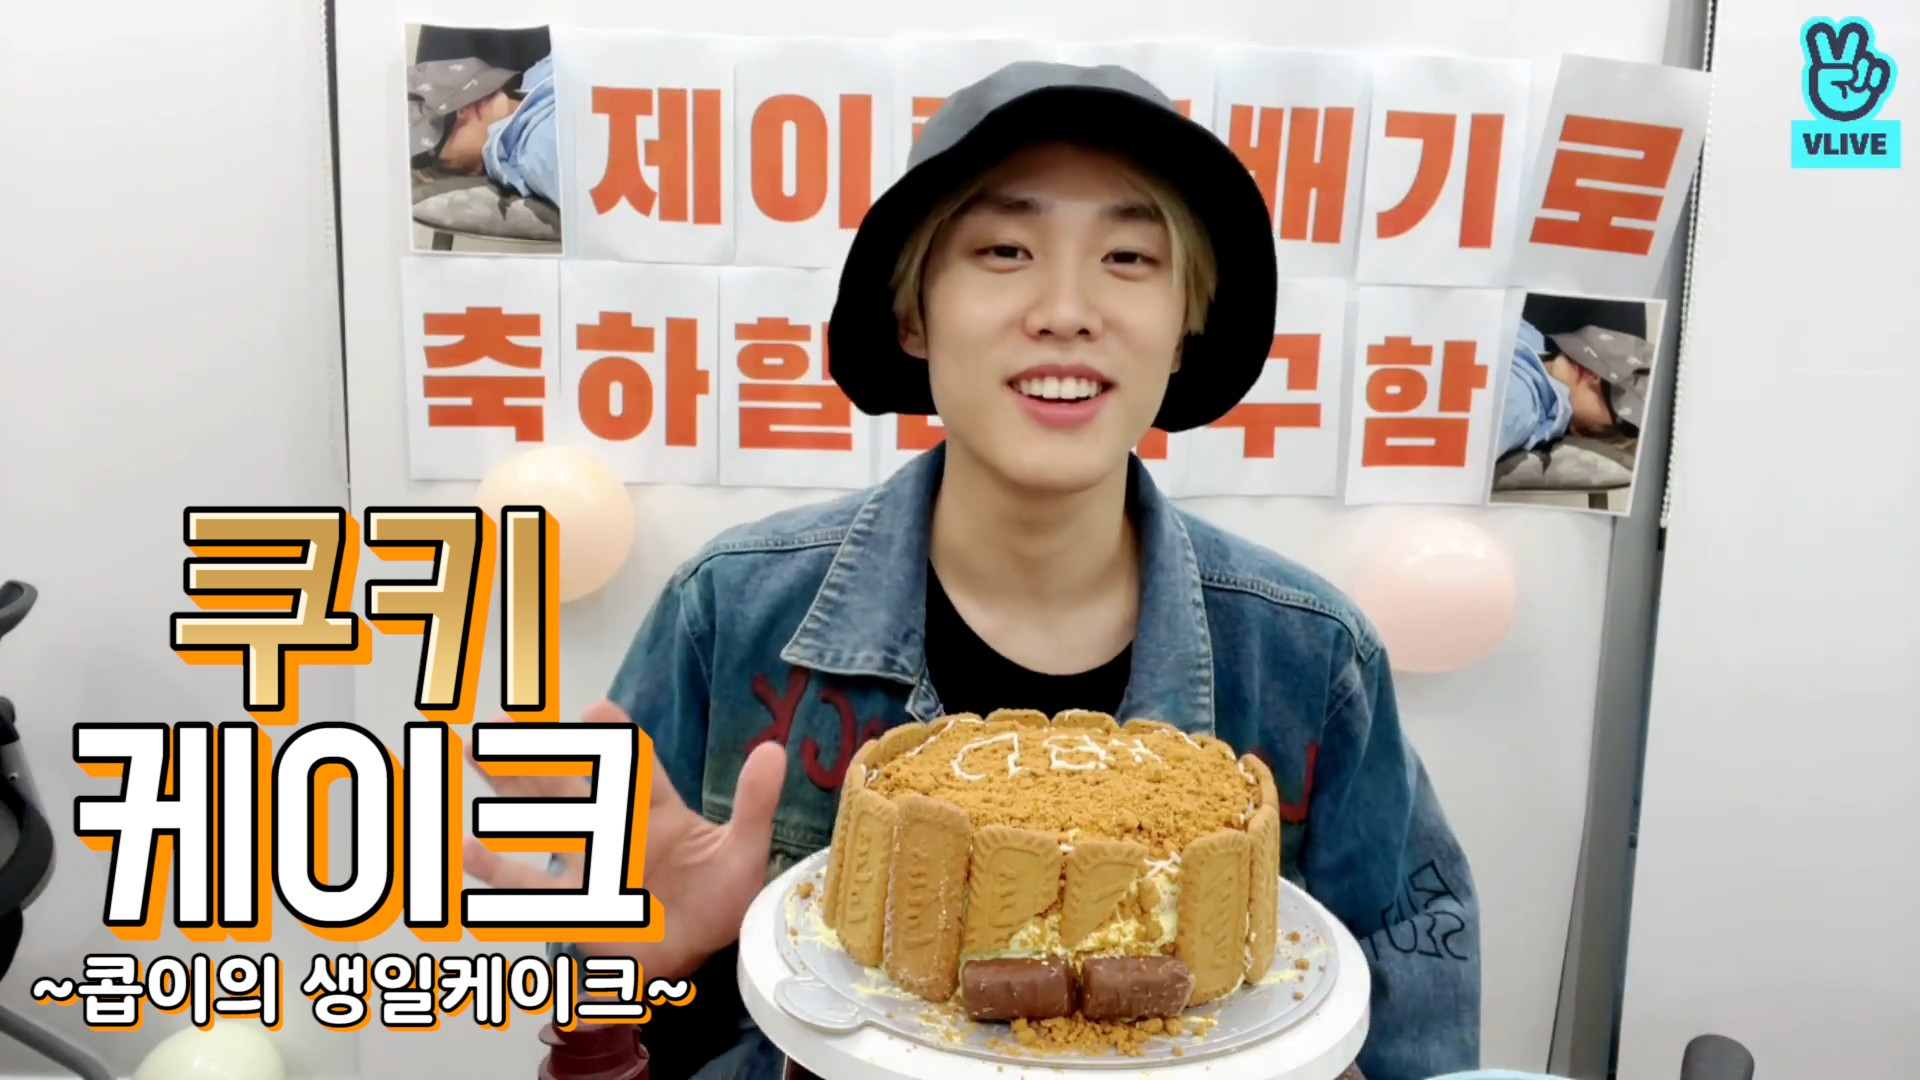 [THE BOYZ] 임기응변의 달인 콥이의 케이크 만들기🎂💛 (HAPPY JACOB DAY!)